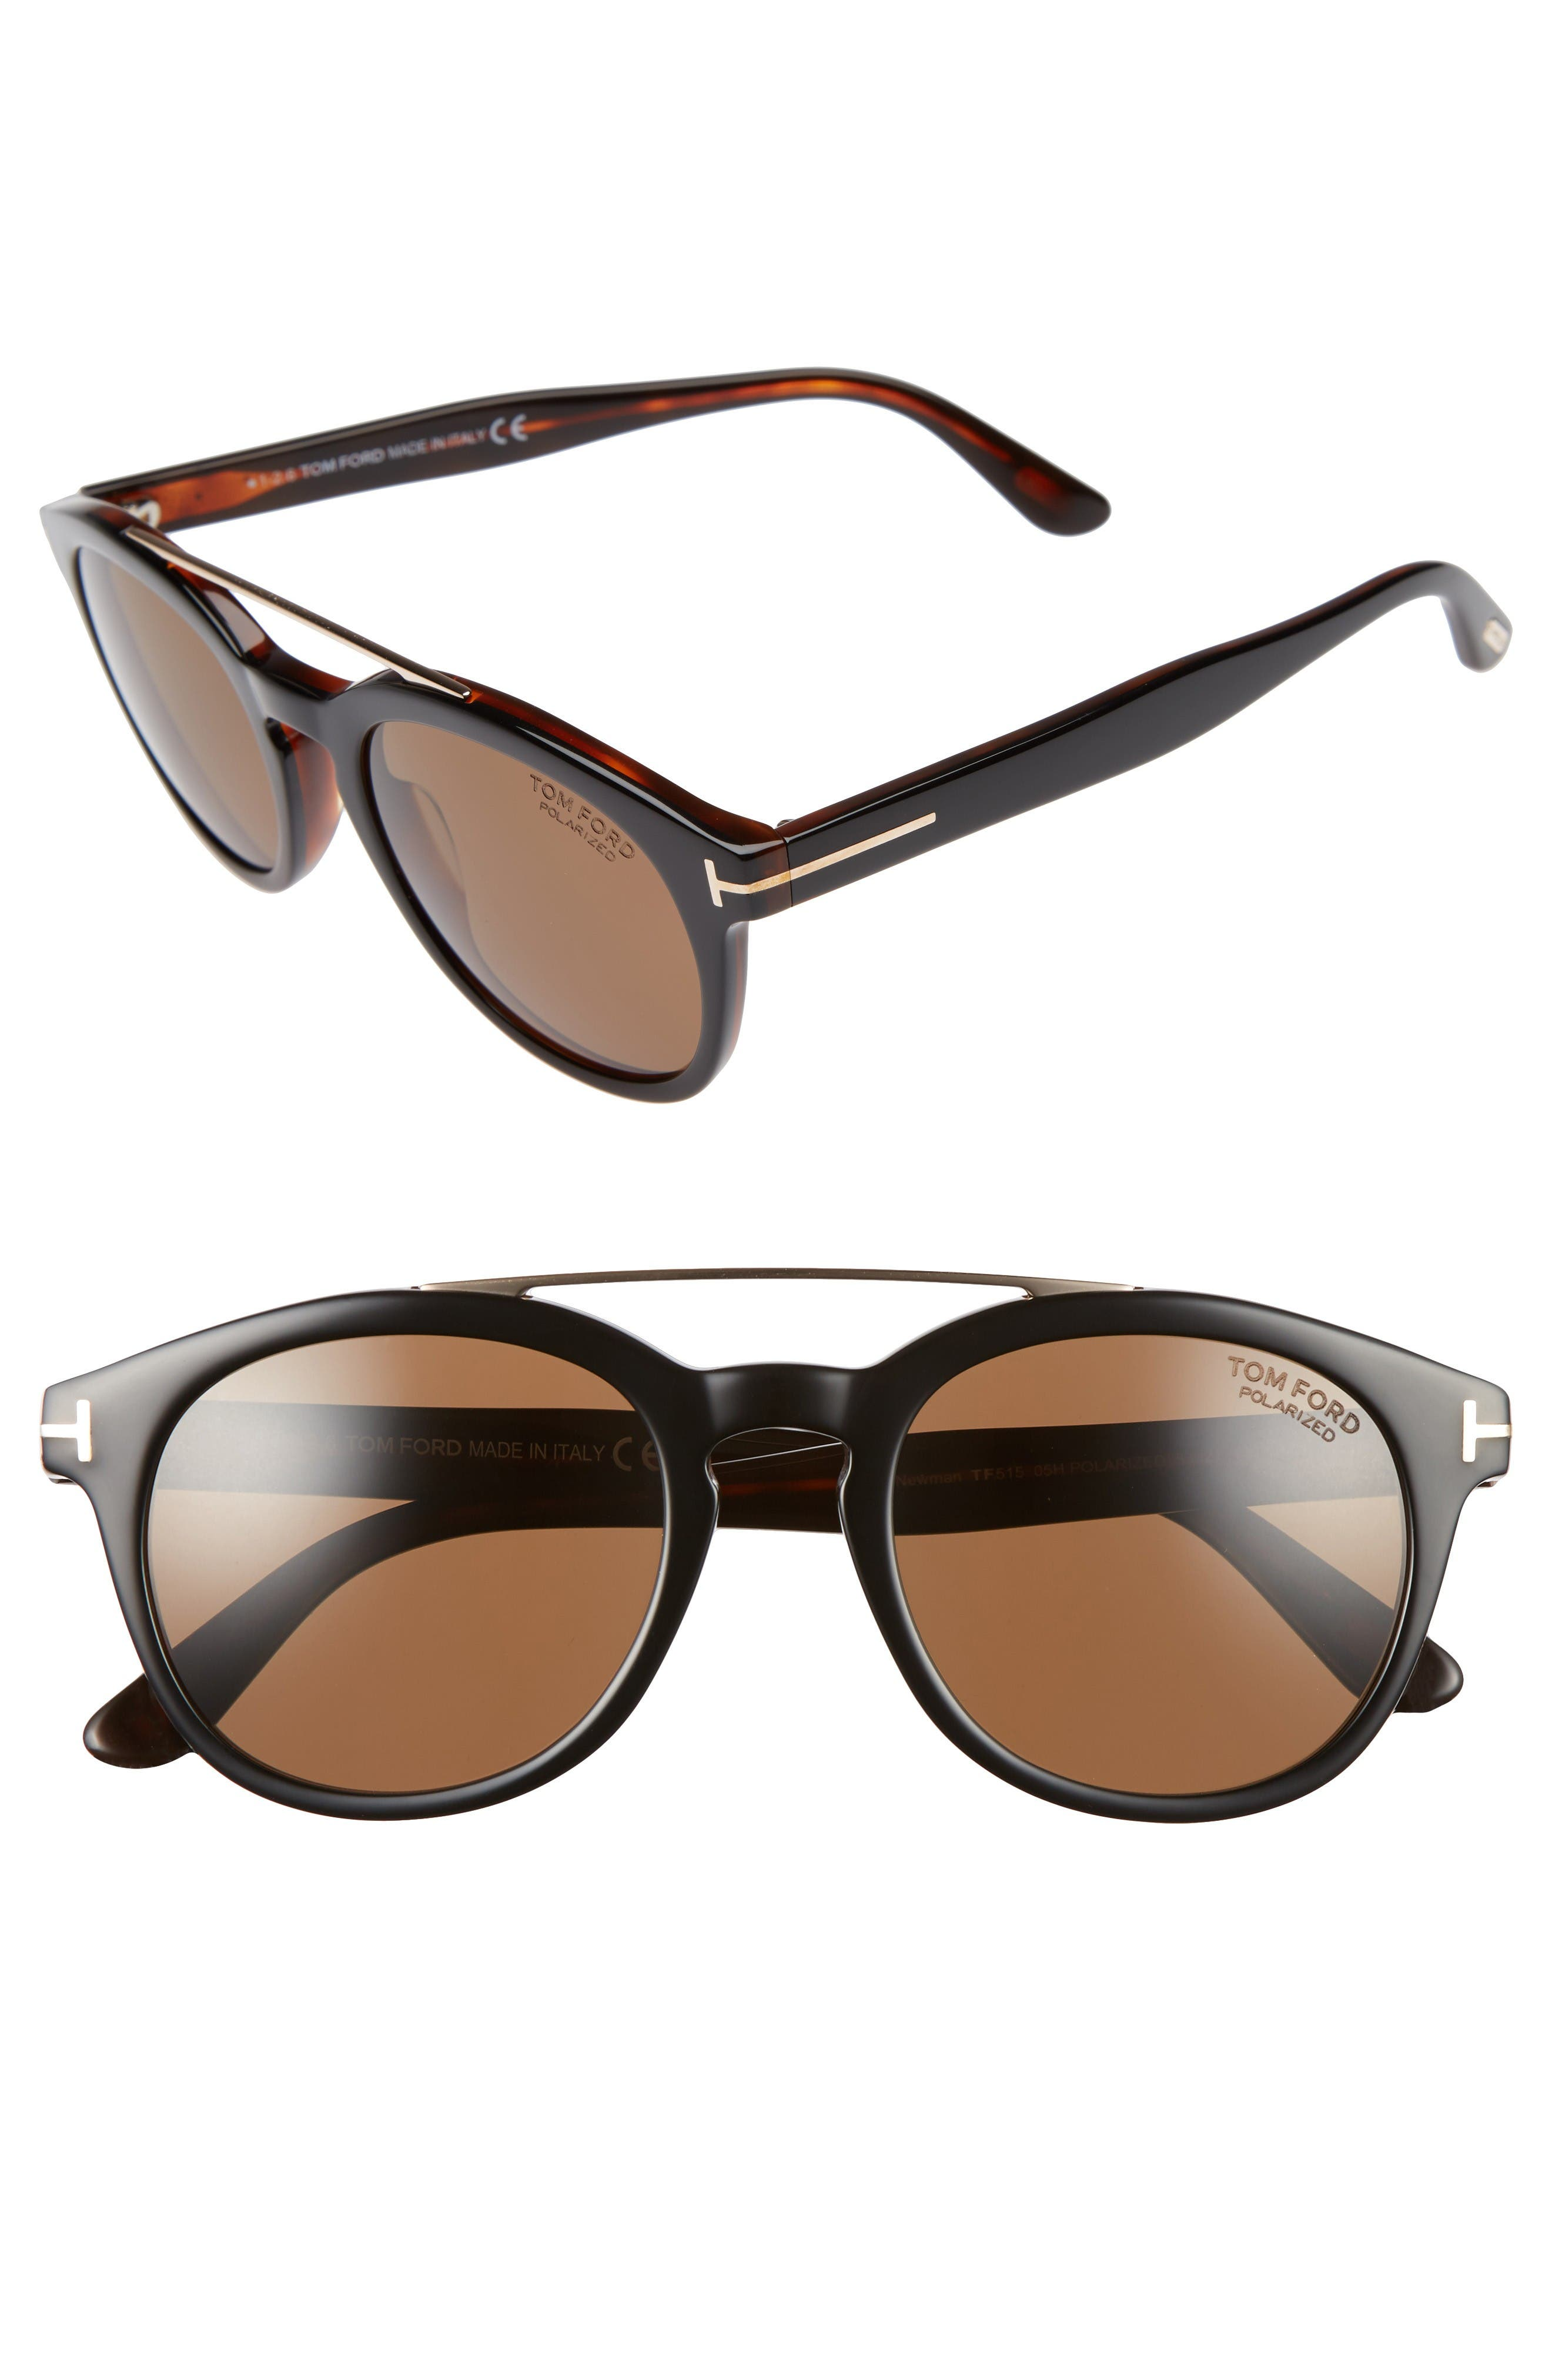 Main Image - Tom Ford Newman 53mm Polarized Sunglasses